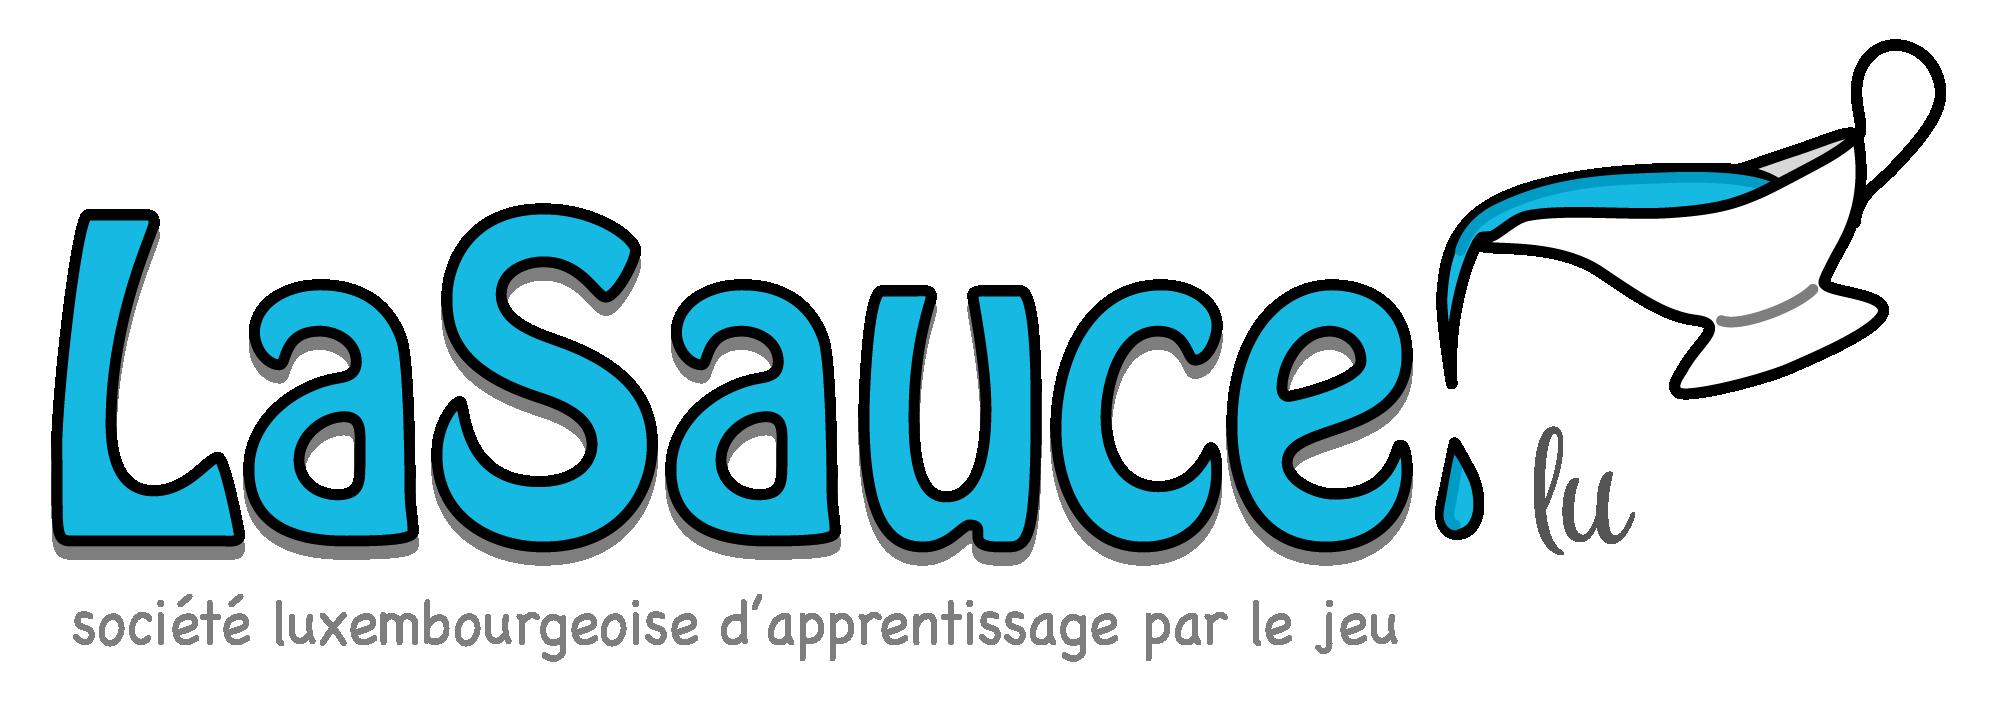 LaSauce